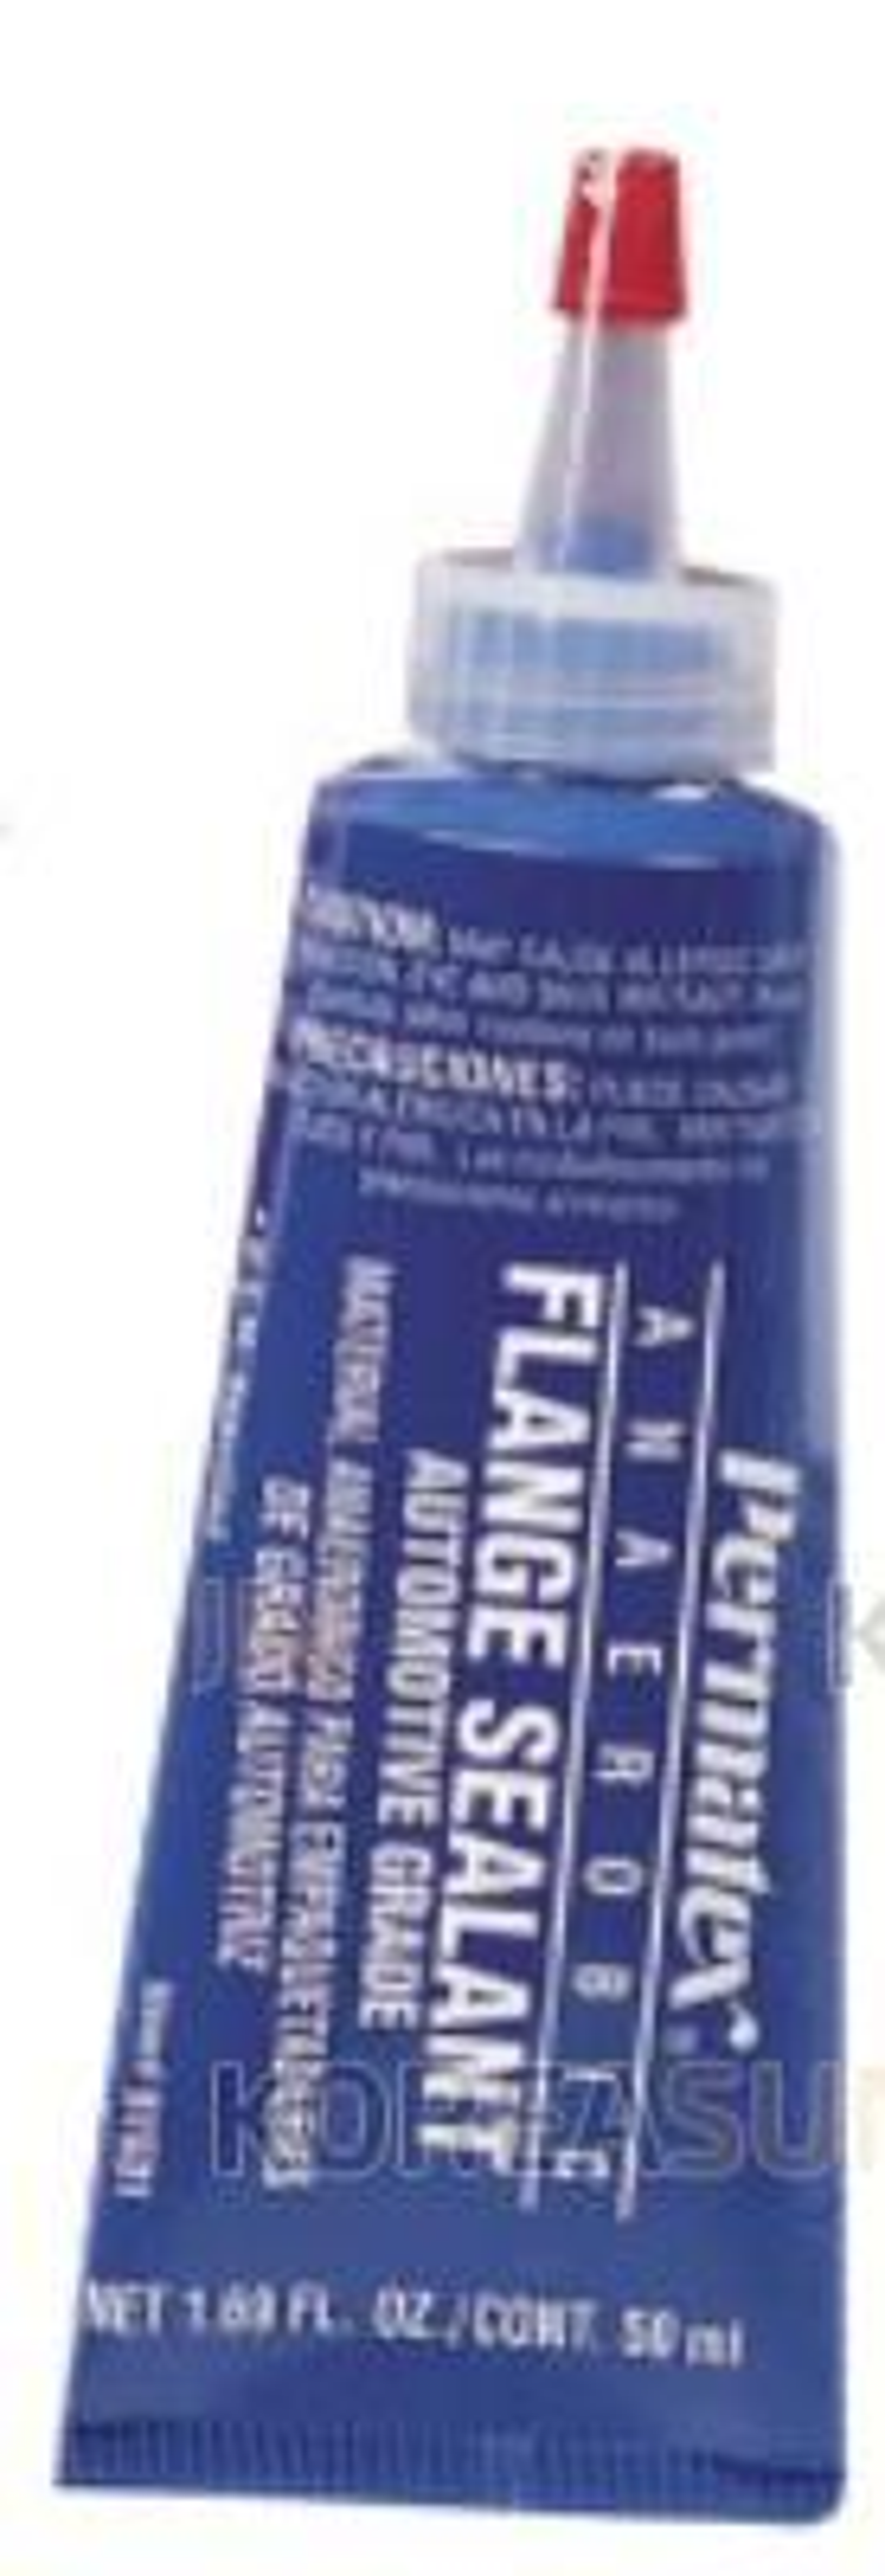 Анаэробный клей-герметик для фланцев тюбик 50мл.